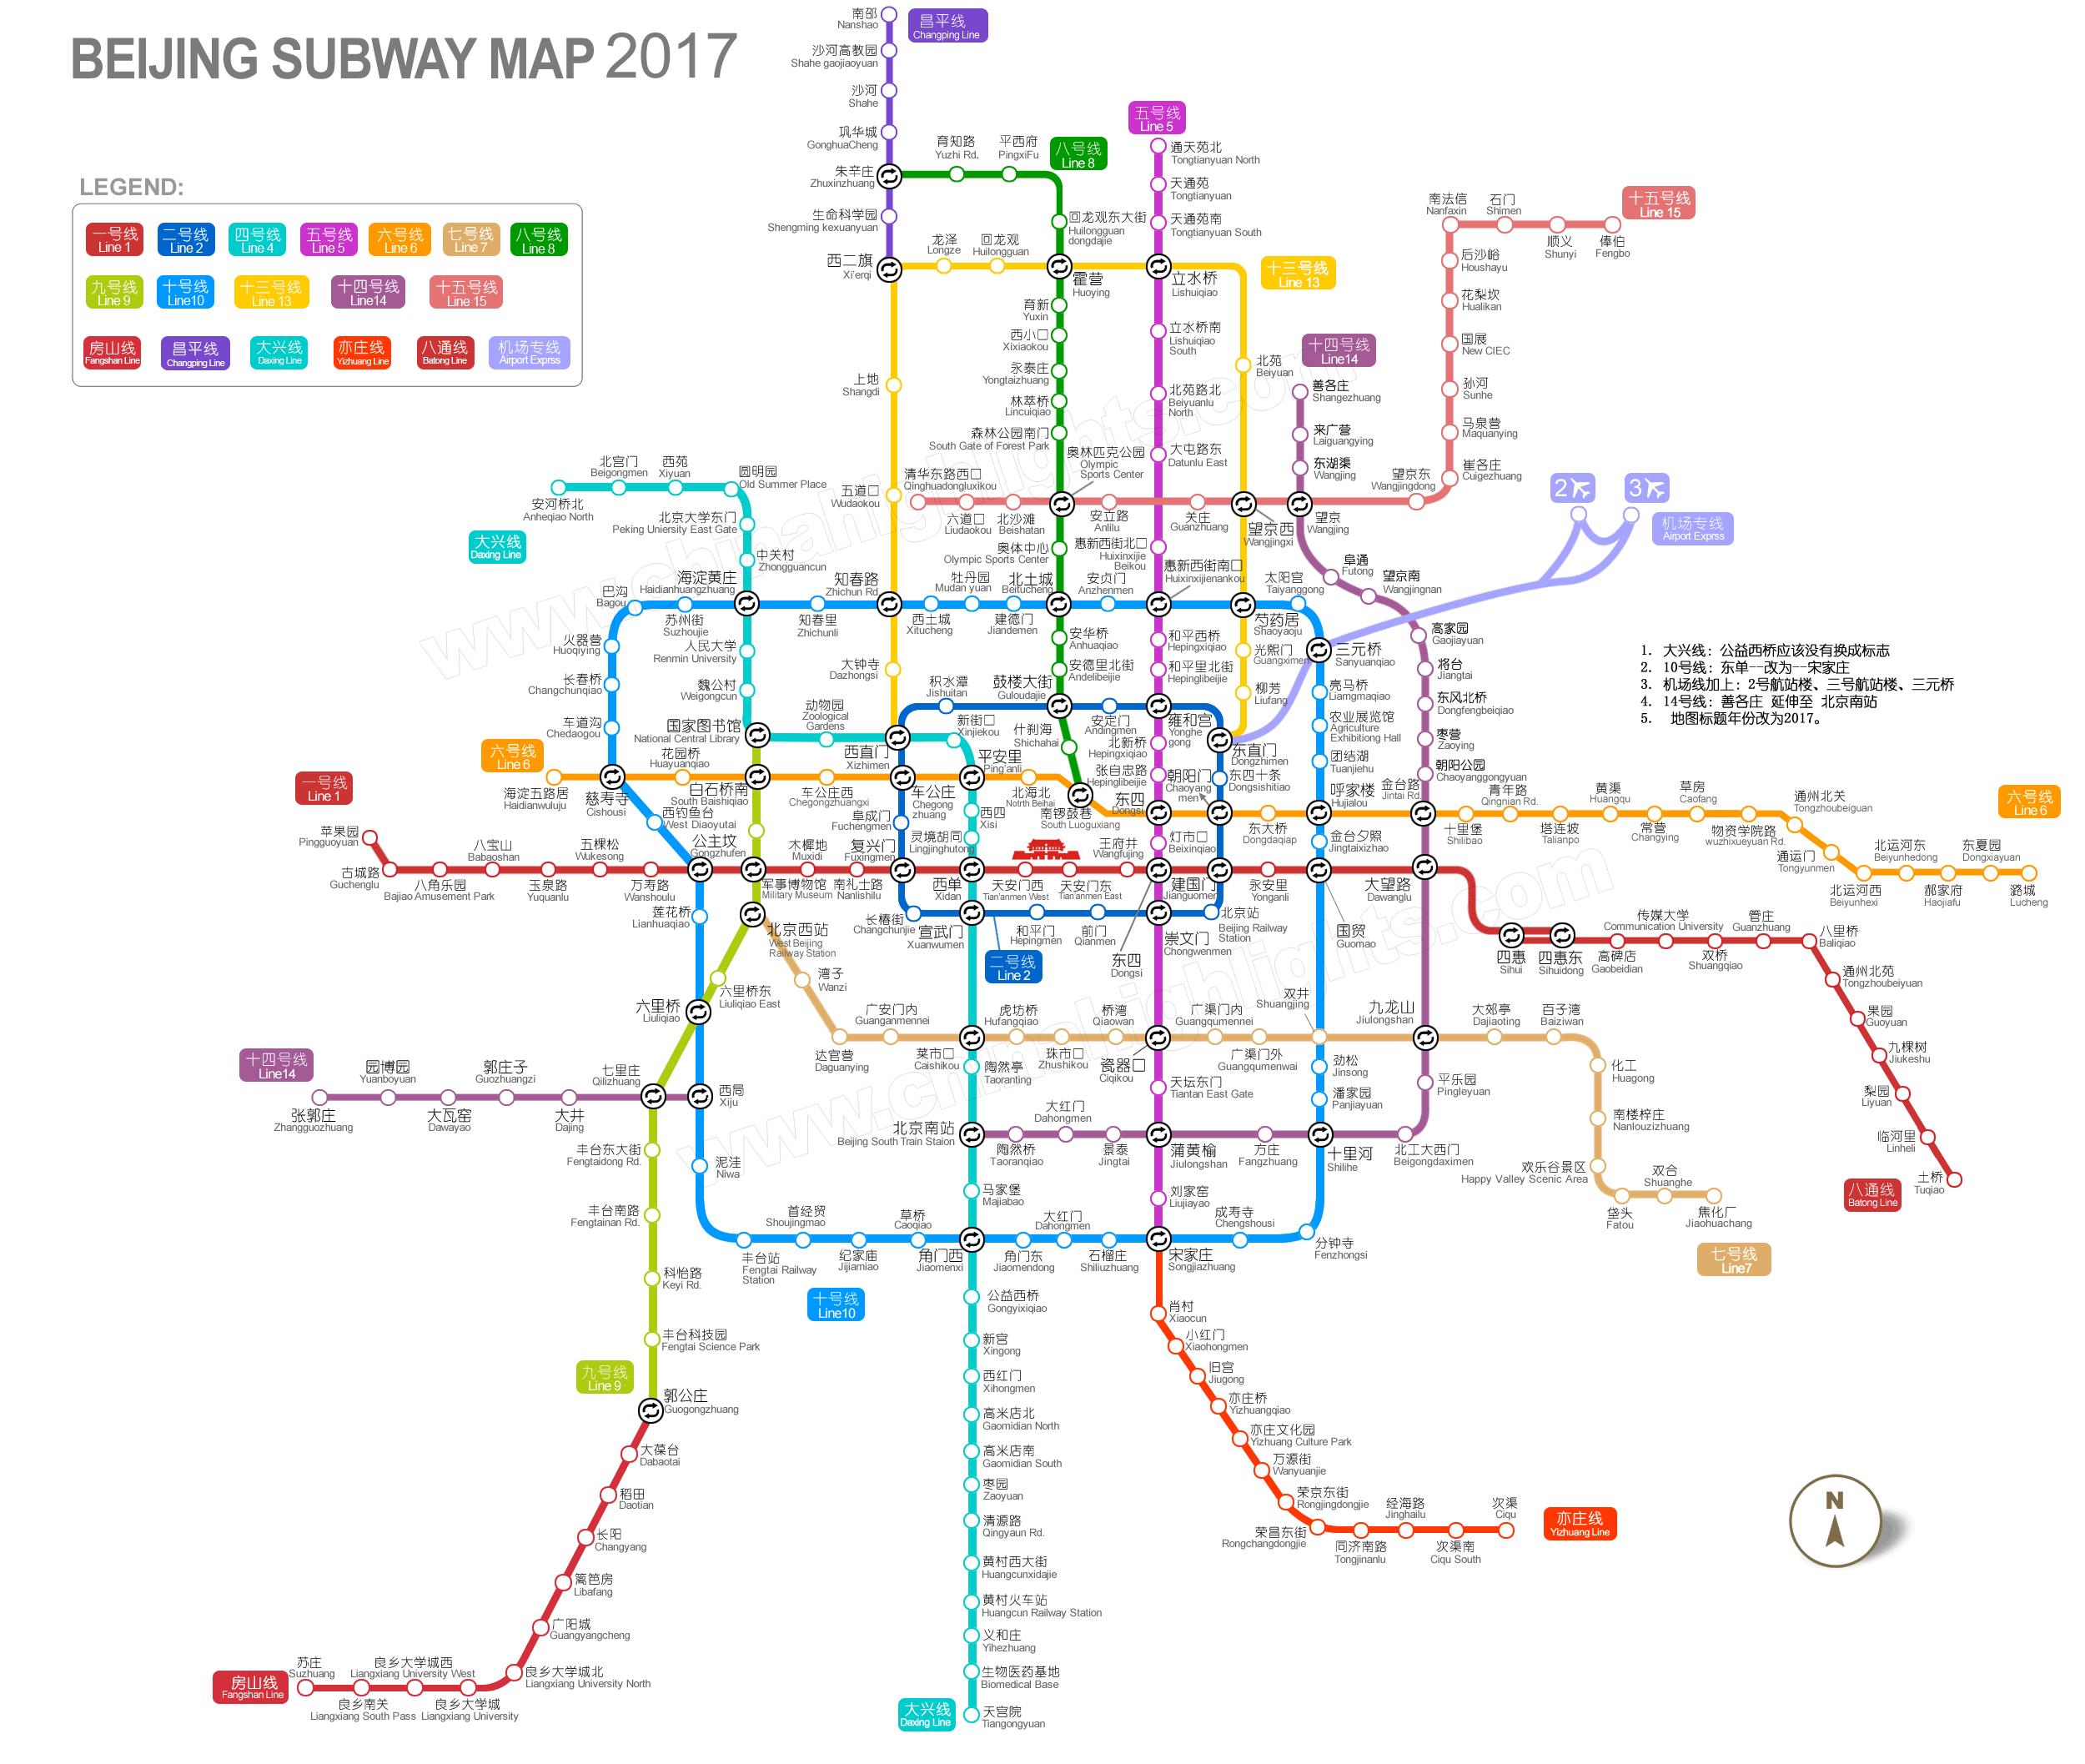 Beijing Subway Map 2015 Beijing Subway Map 2017, Latest Maps of Beijing Subway and Stations Beijing Subway Map 2015